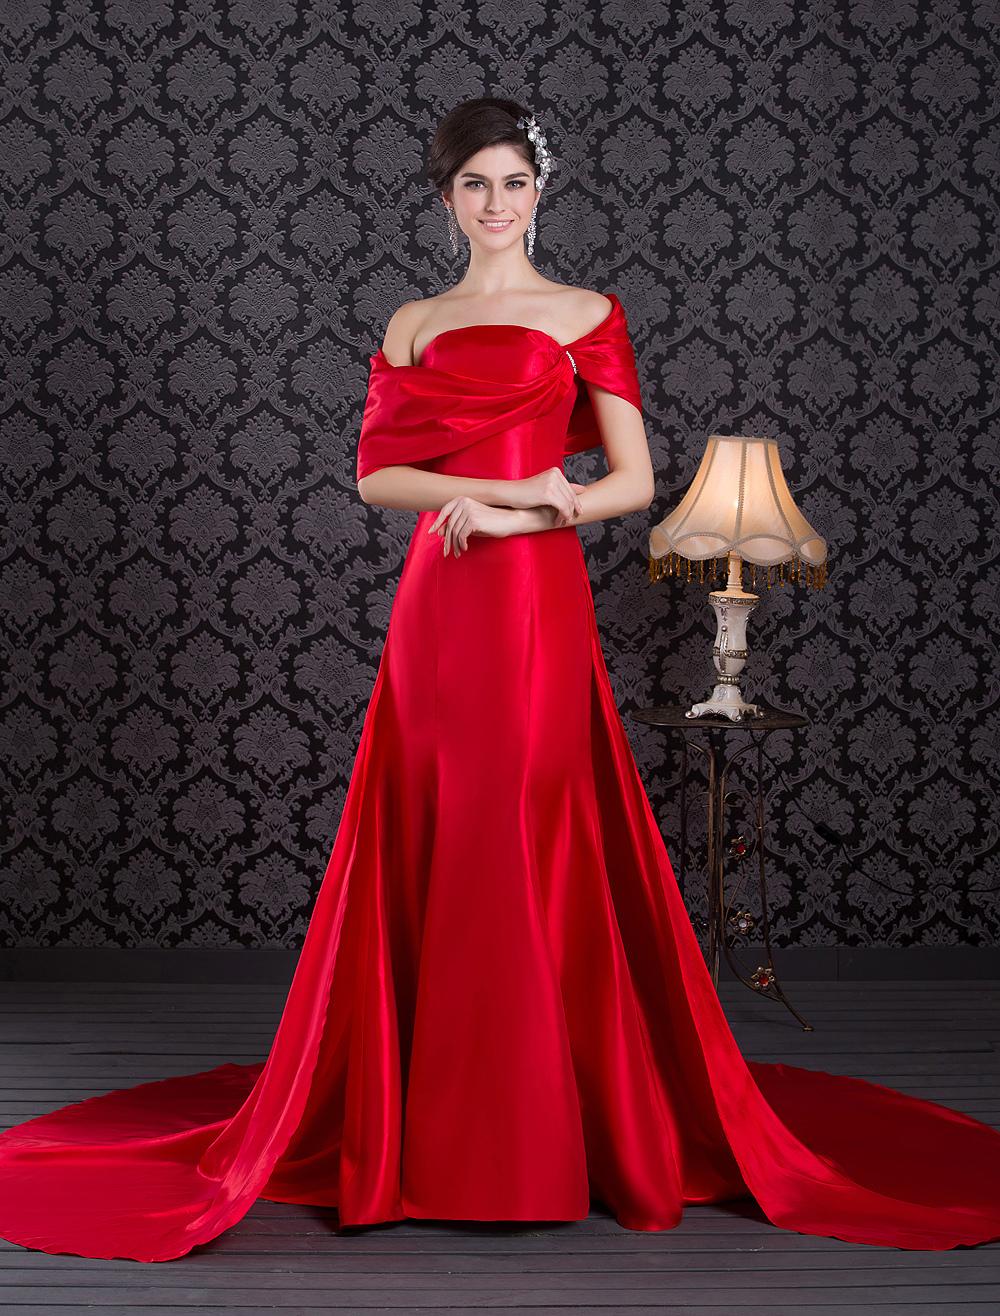 Elegant Red Taffeta Beading Strapless Fashion Evening Dress (Wedding Evening Dresses) photo